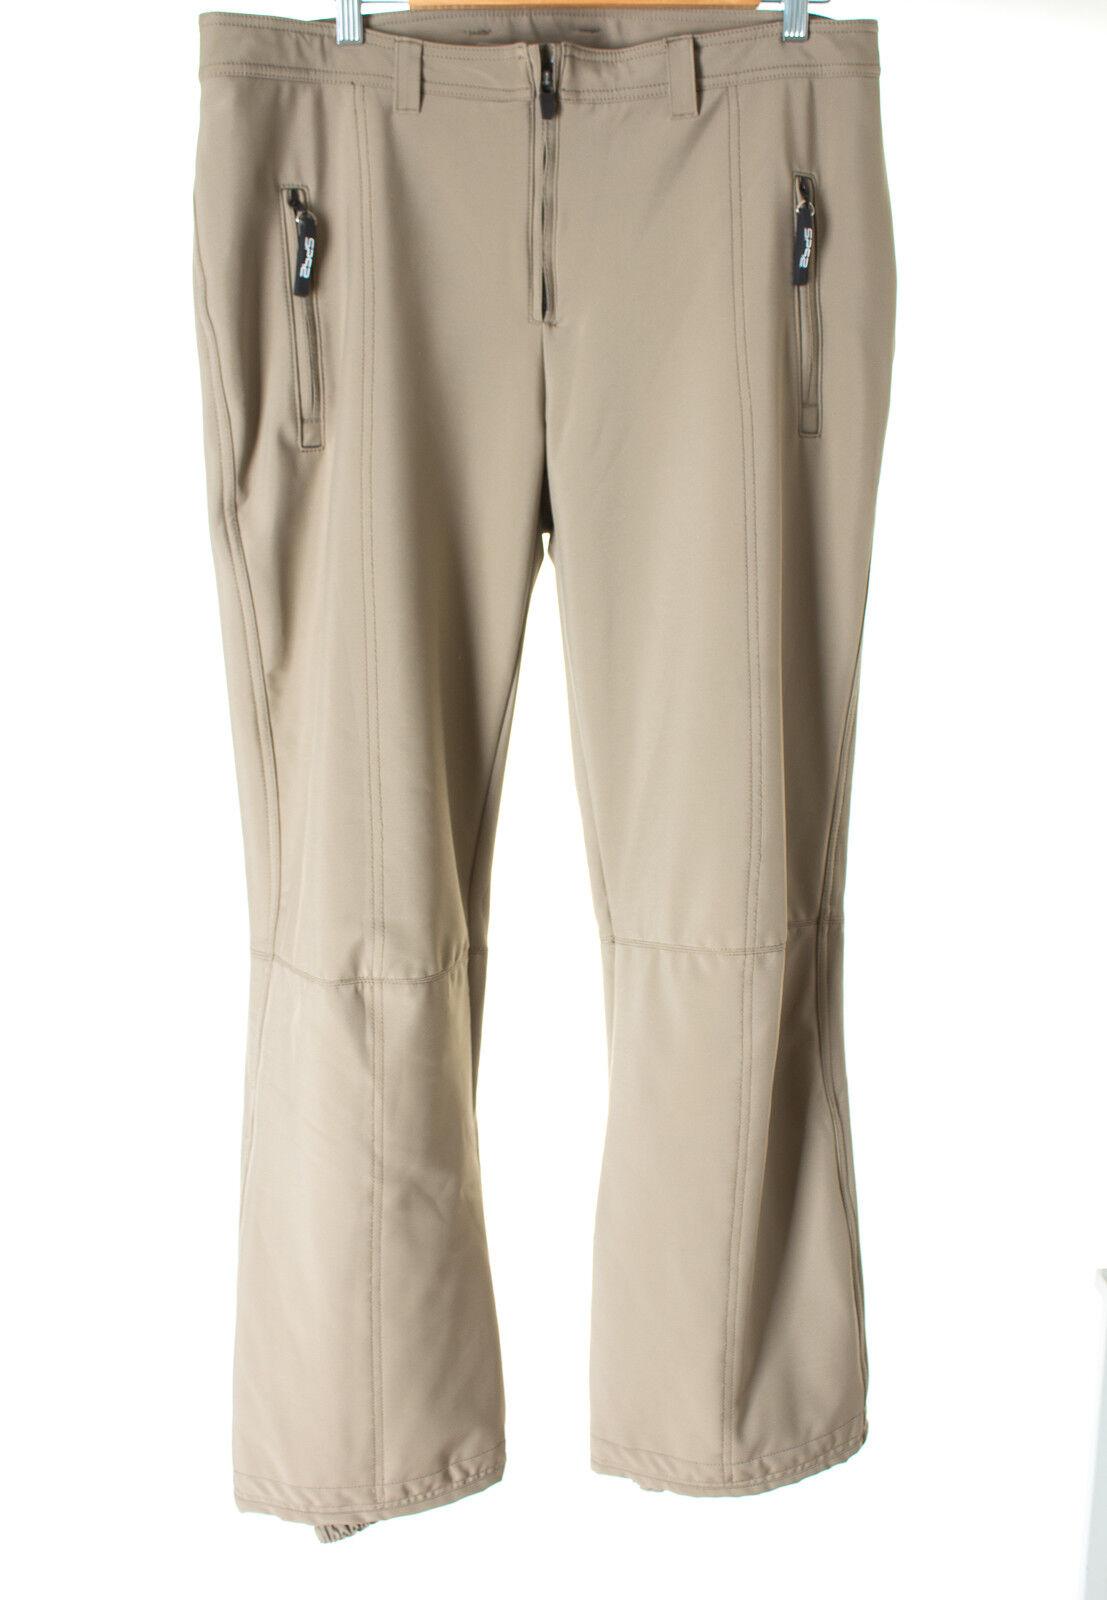 Sportalm Kitzbühel Hose Outdoorhose Trousers Trousers Trousers Pants Damen Gr. DE 46 in Graubraun 0476d5